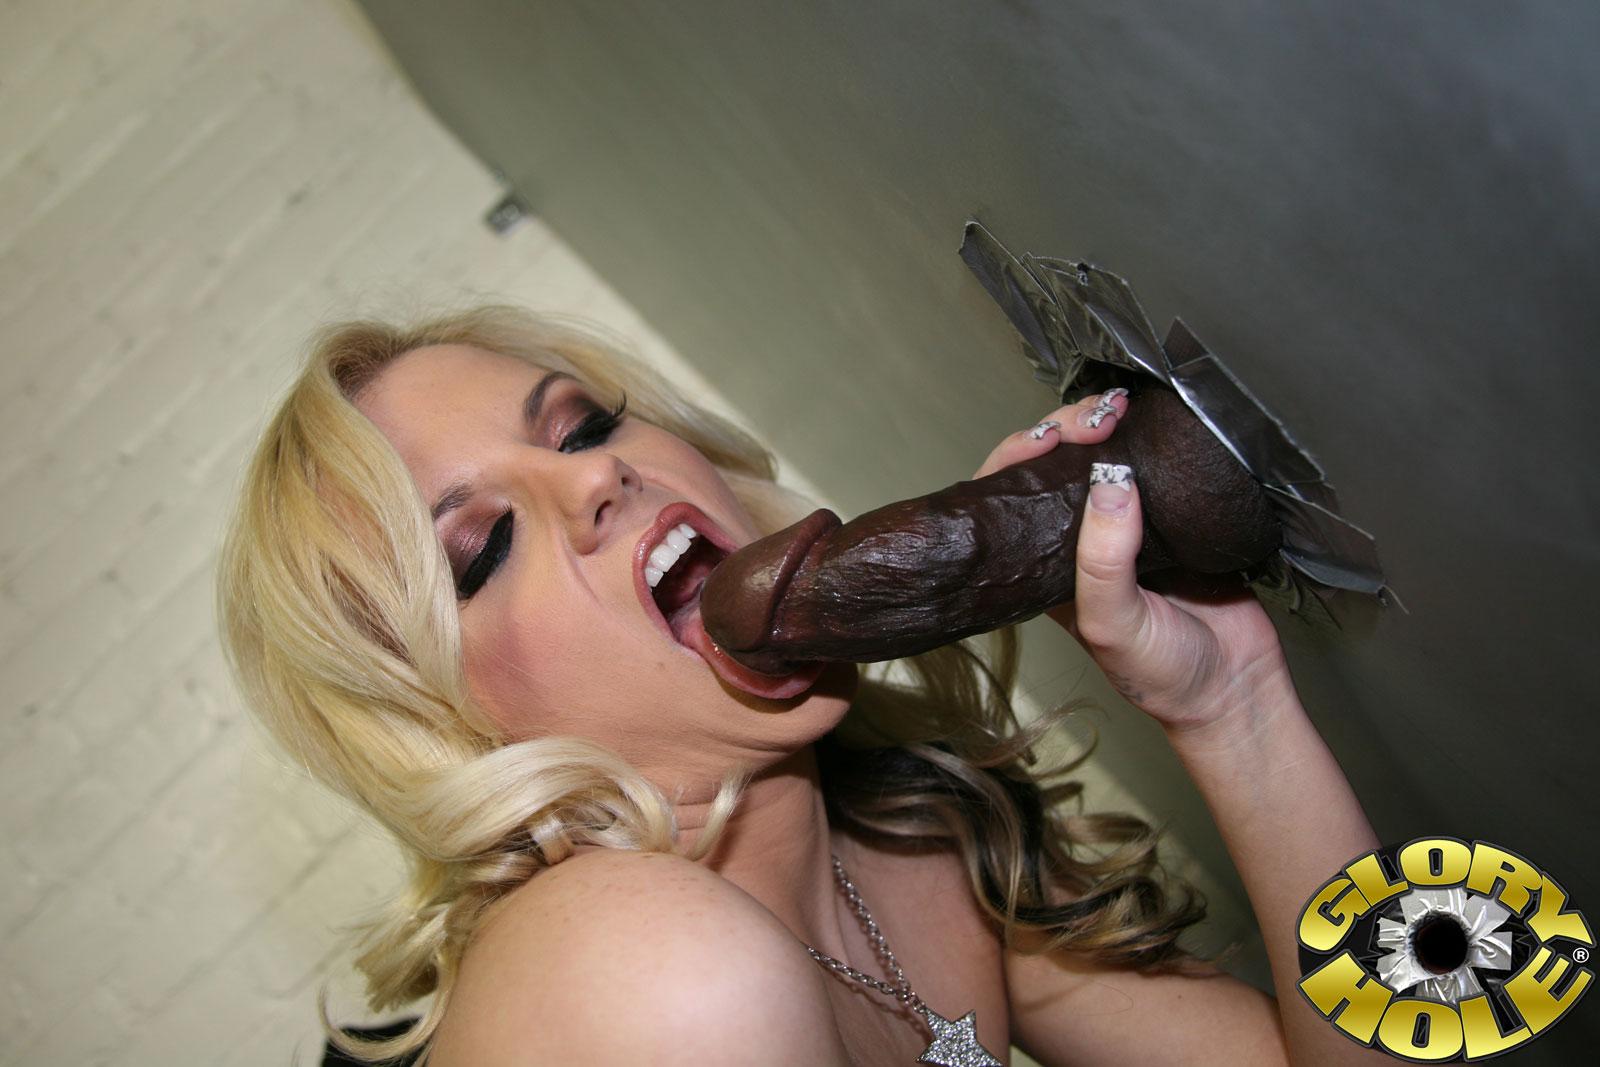 Blonde big tits gloryhole Gloryhole Com Haley Cummings Big Tit Blonde Haley Cummings Sucking Black Cock 130601 Good Sex Porn